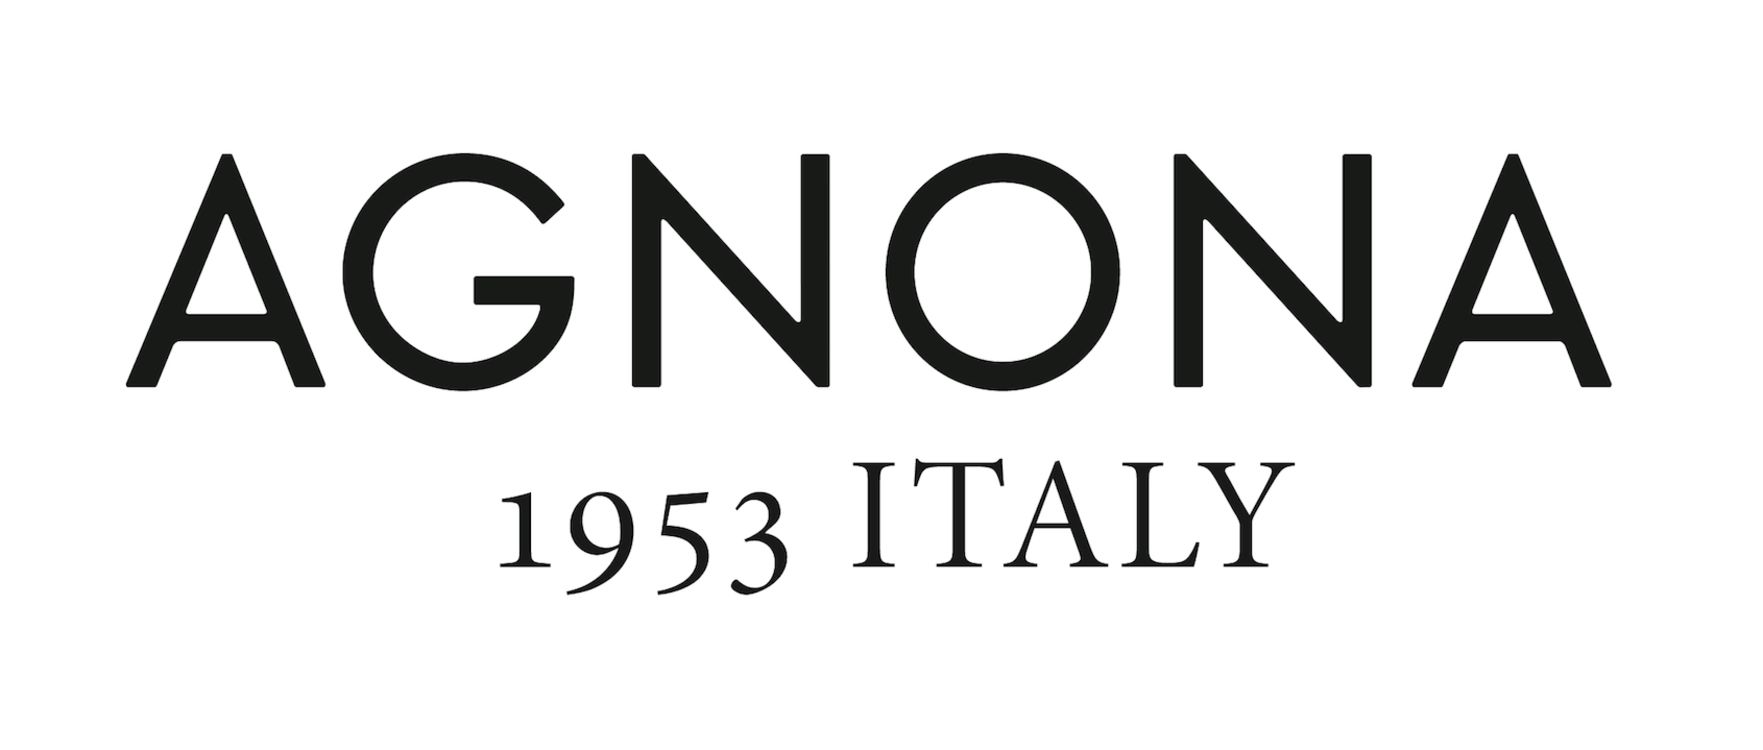 AGNONA (Image 1)